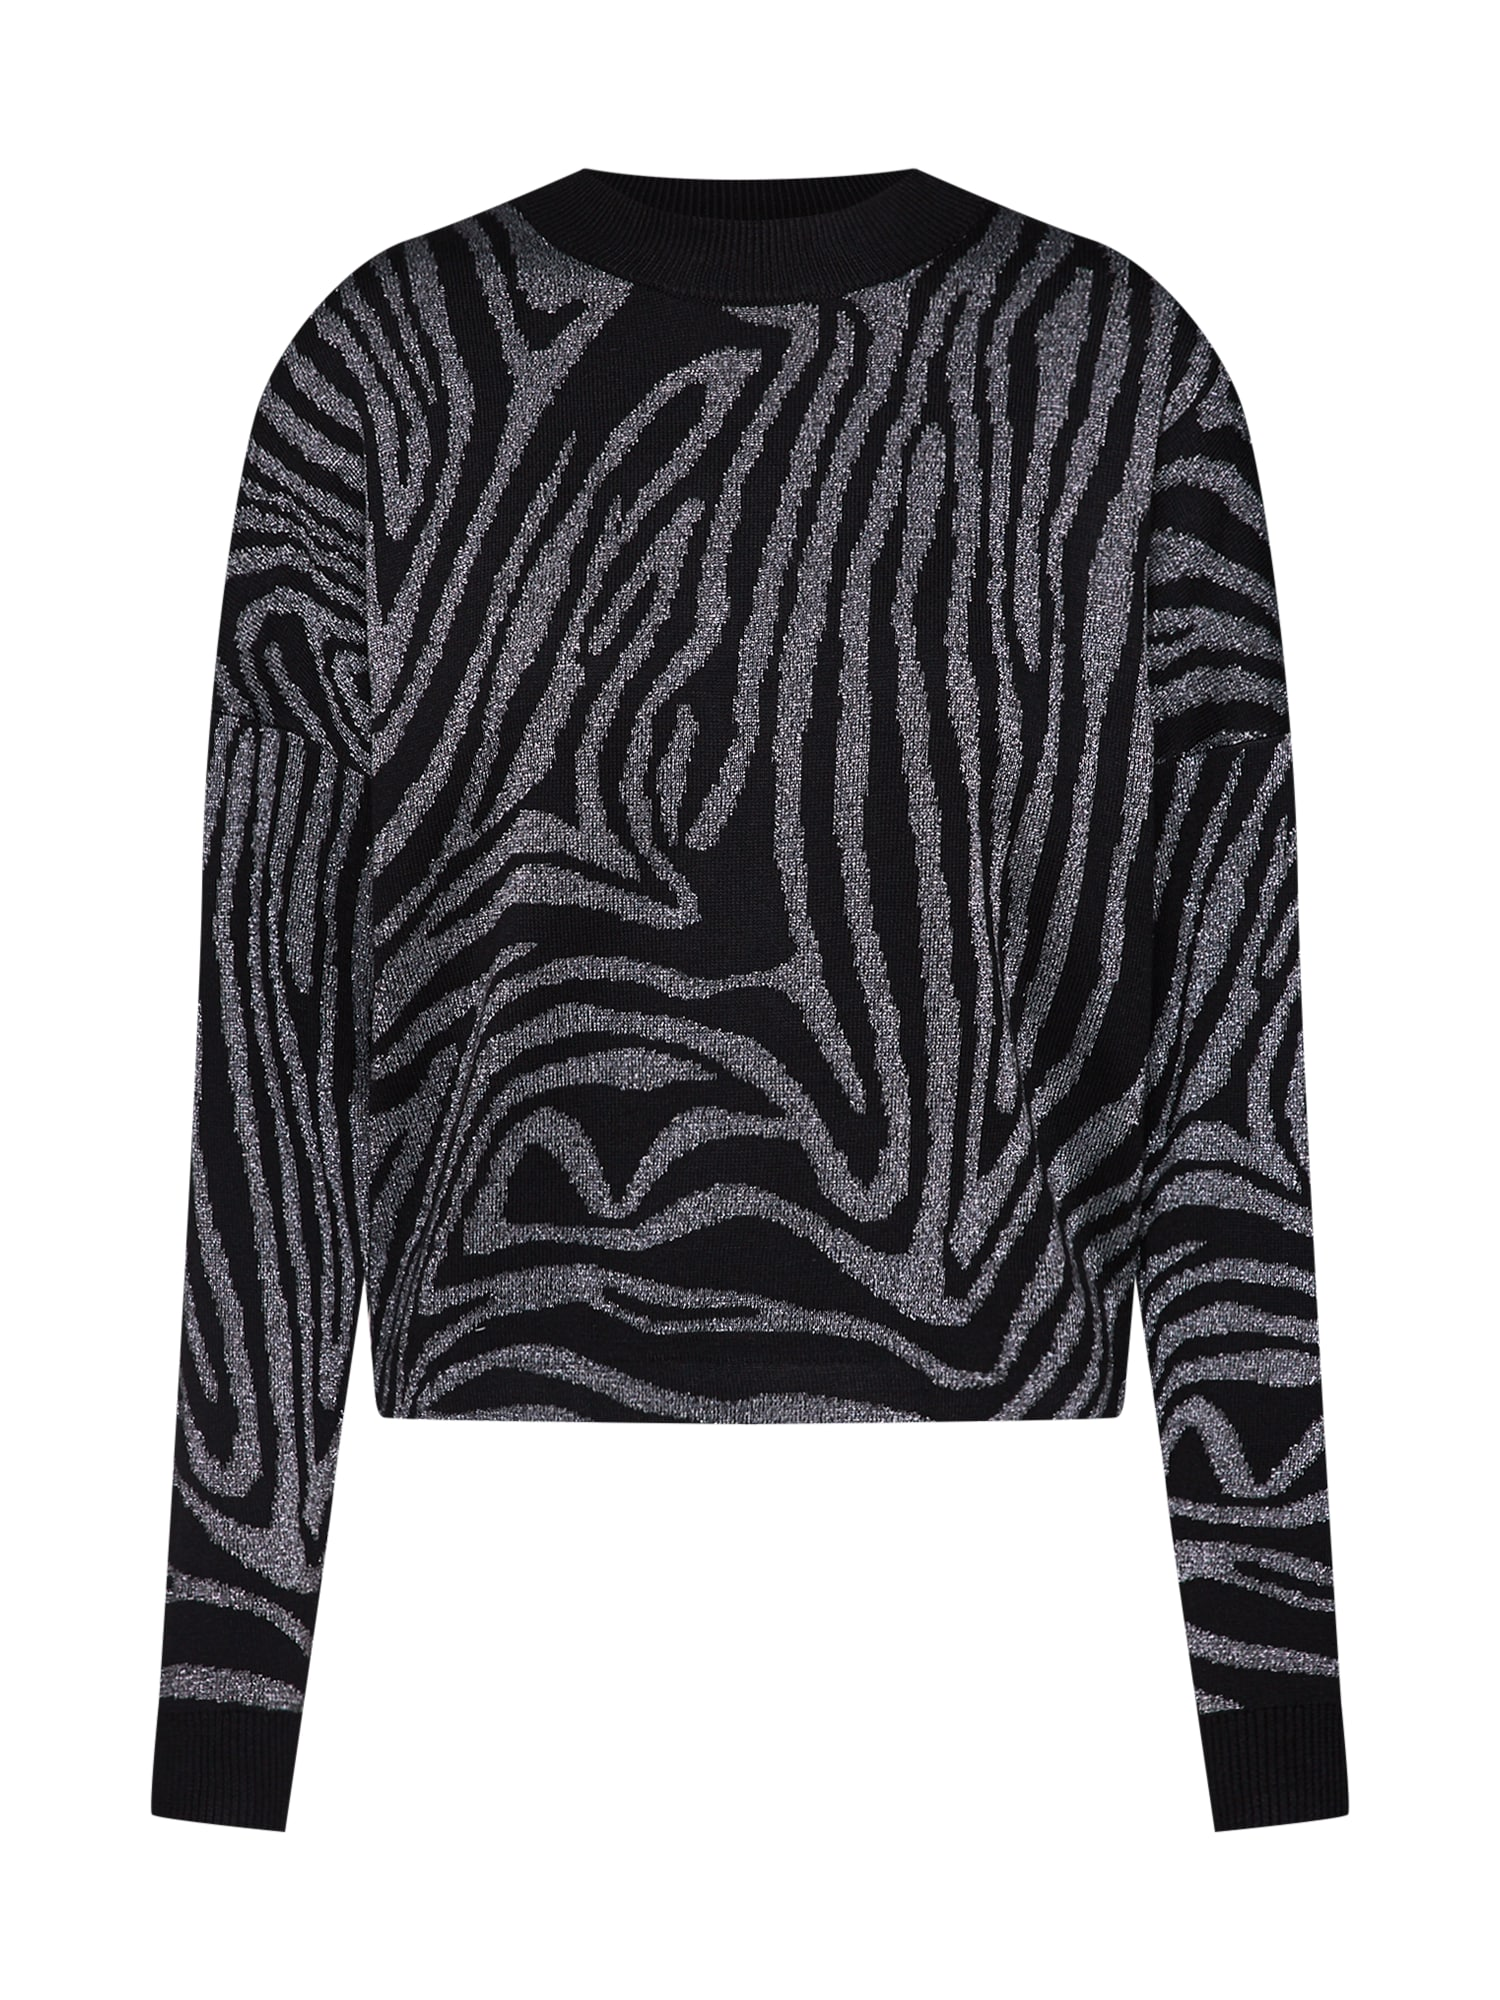 Svetr Zebra lurex print jumper černá stříbrná Mint&berry